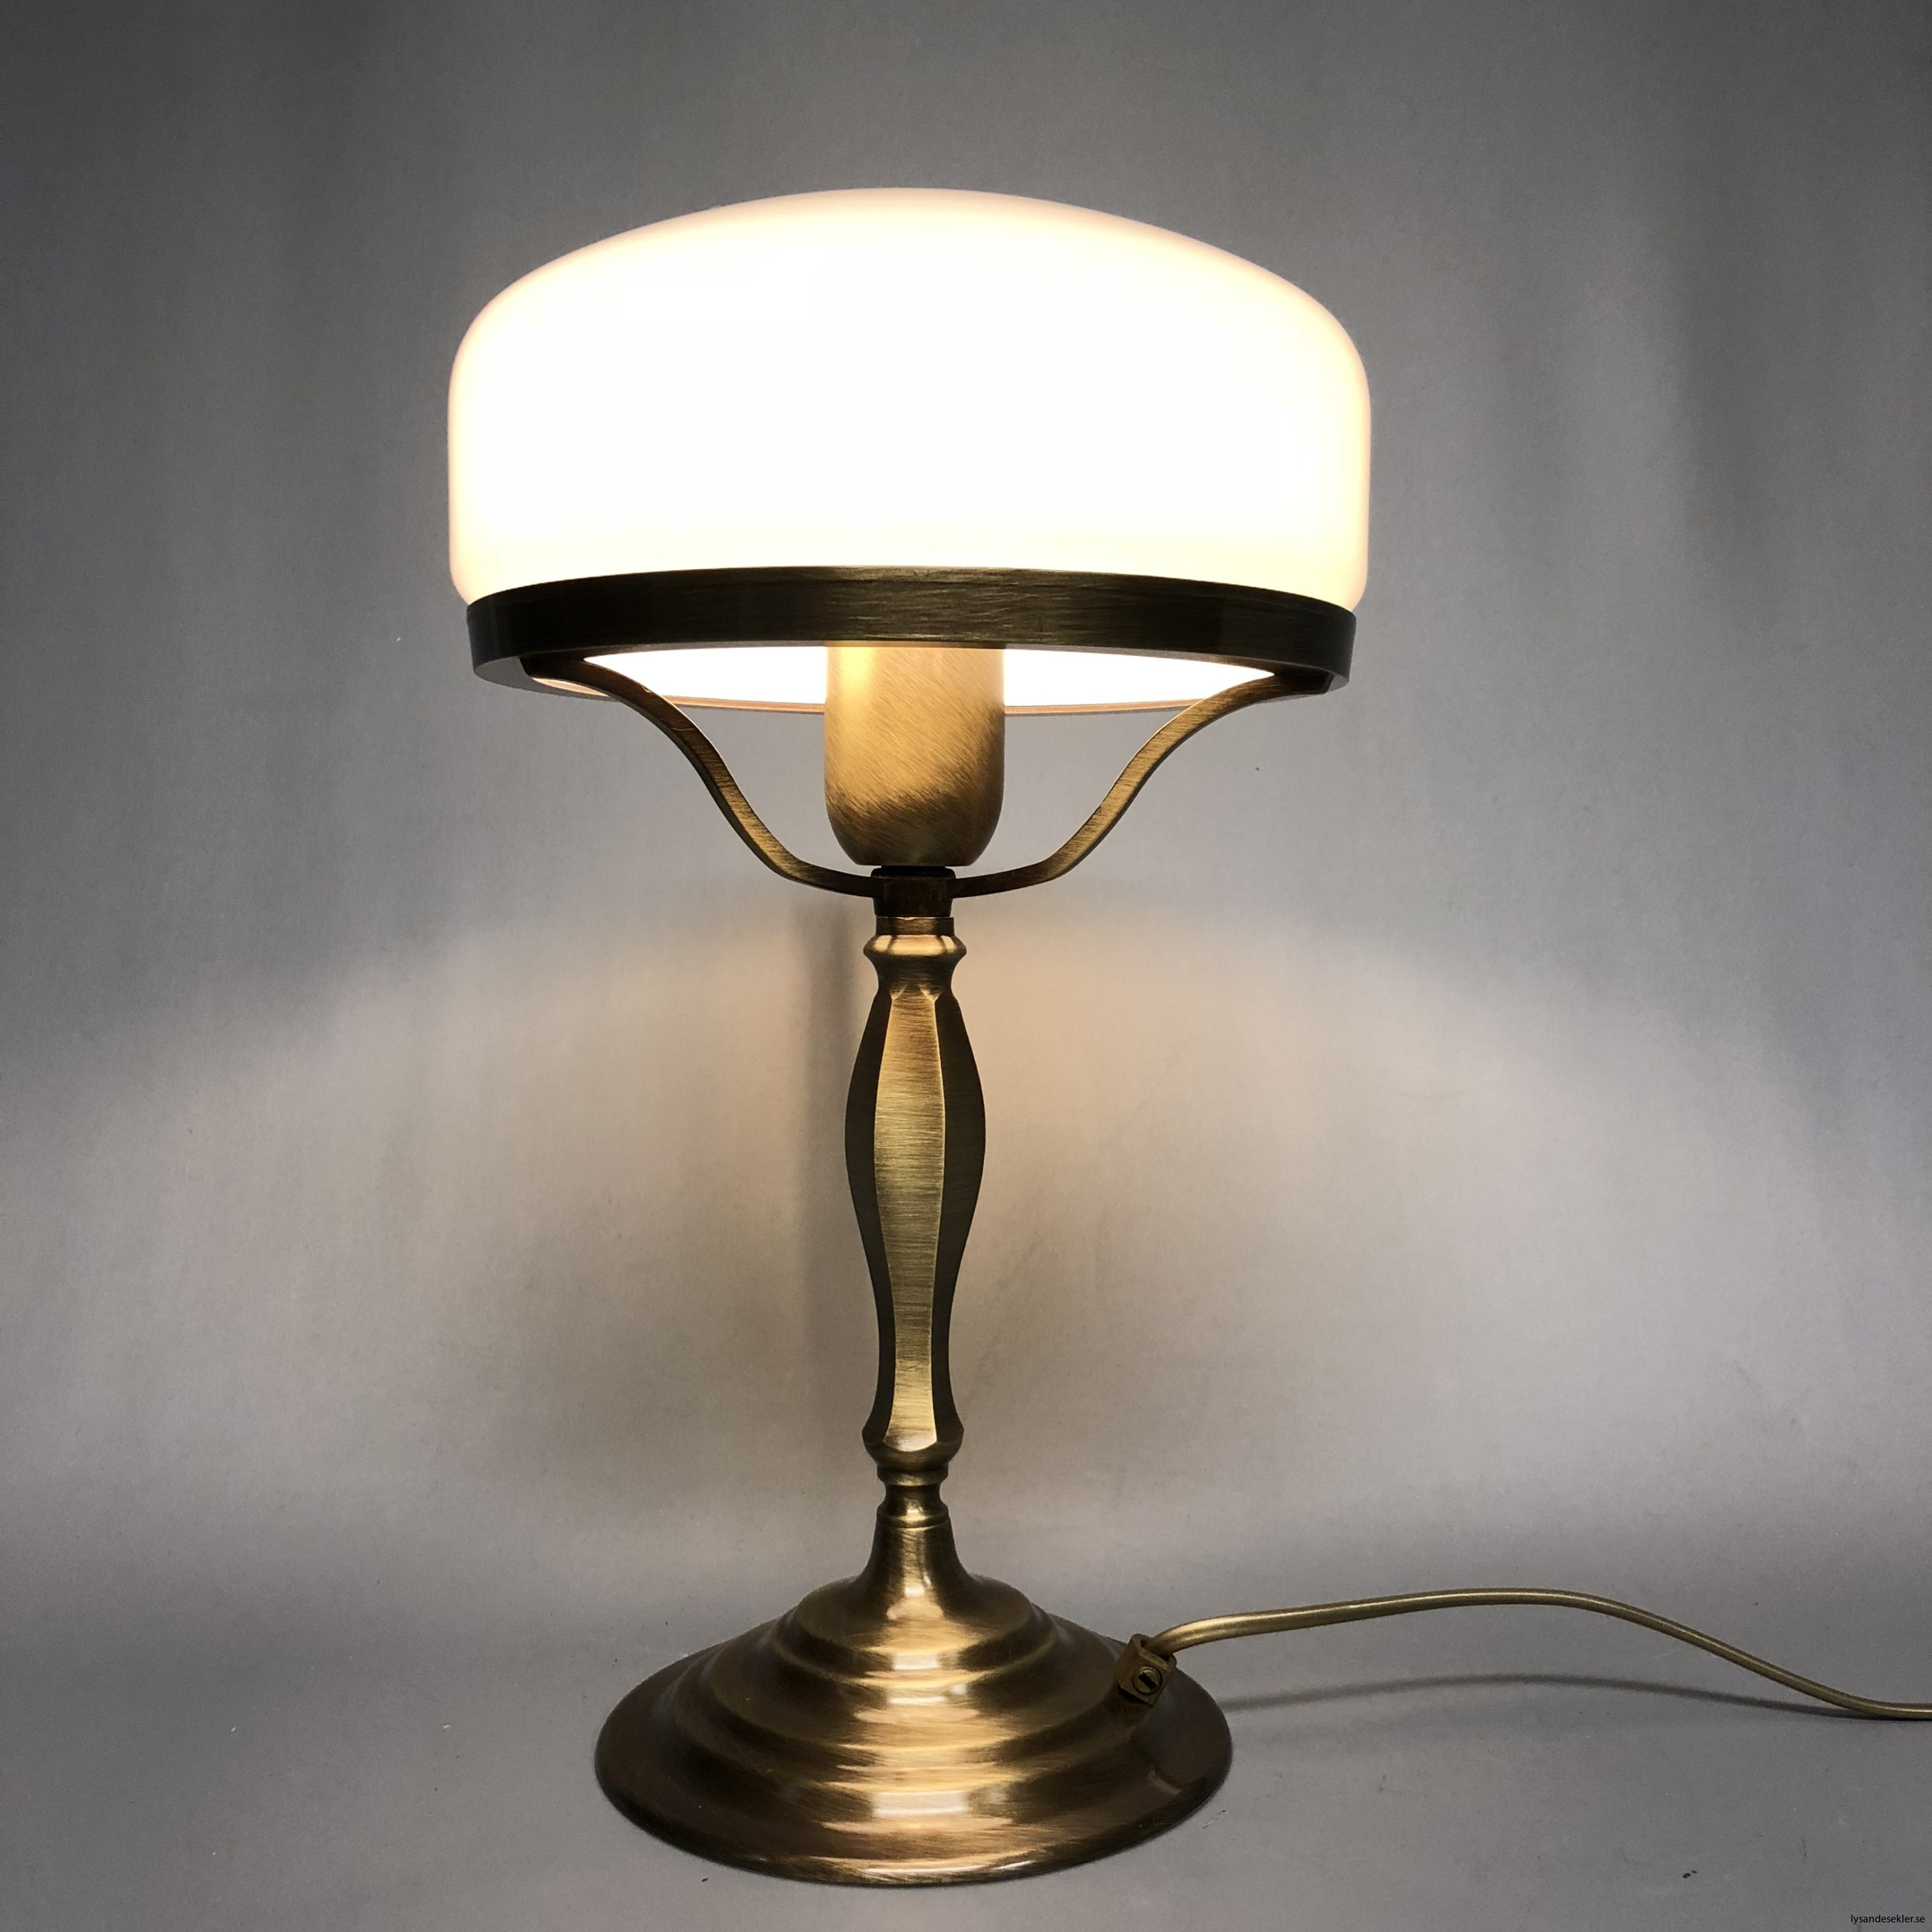 strindbergslampa strindbergslampor strindberg lampa skärm kupa strindbergsskärm strindbergskupa1